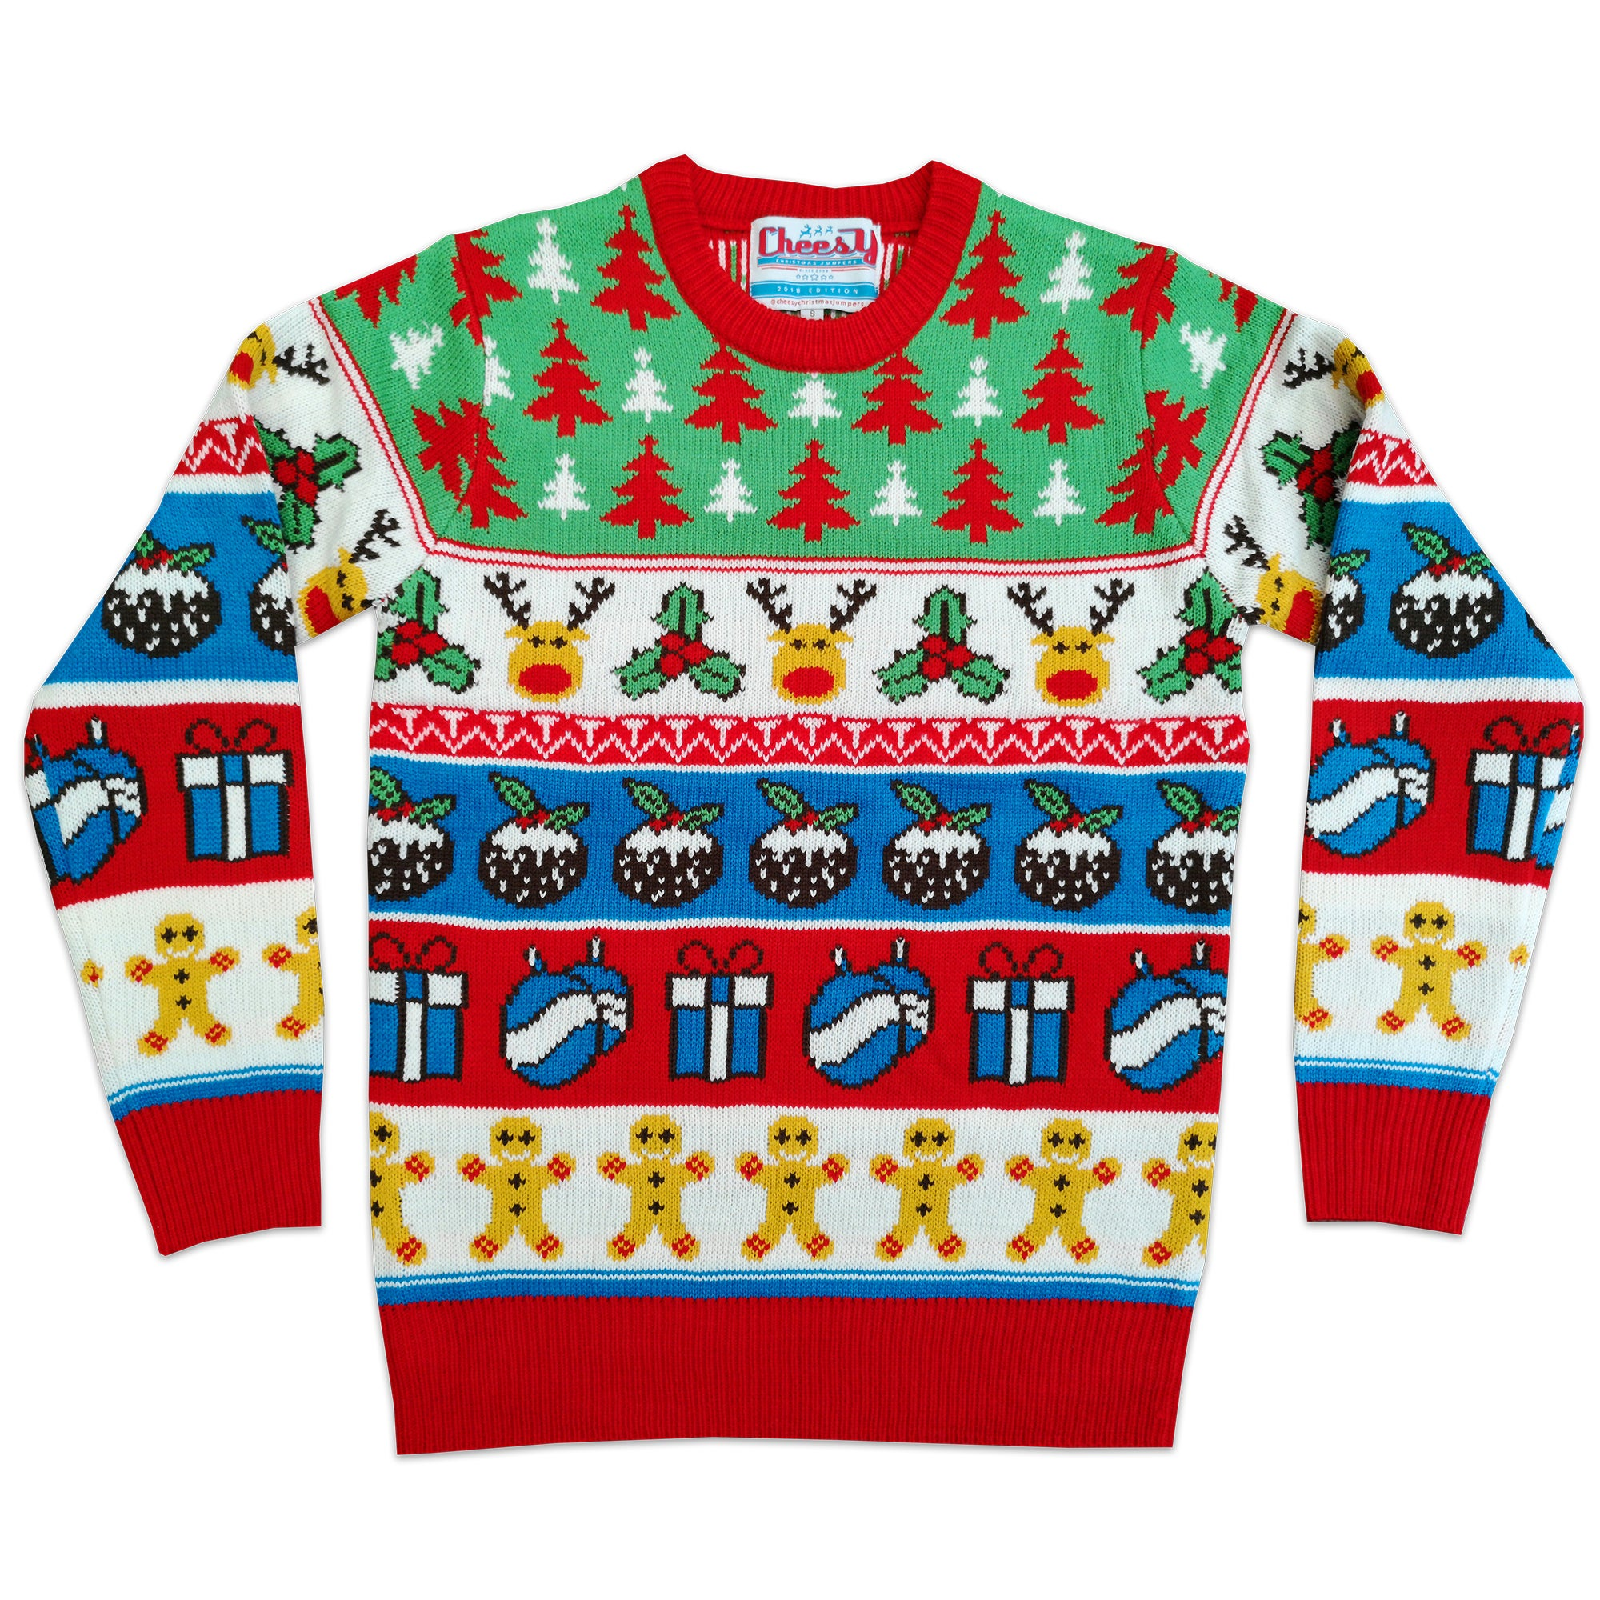 Holly Jolly Crimbo - Unisex Christmas Jumper / Cheesy Christmas Jumpers